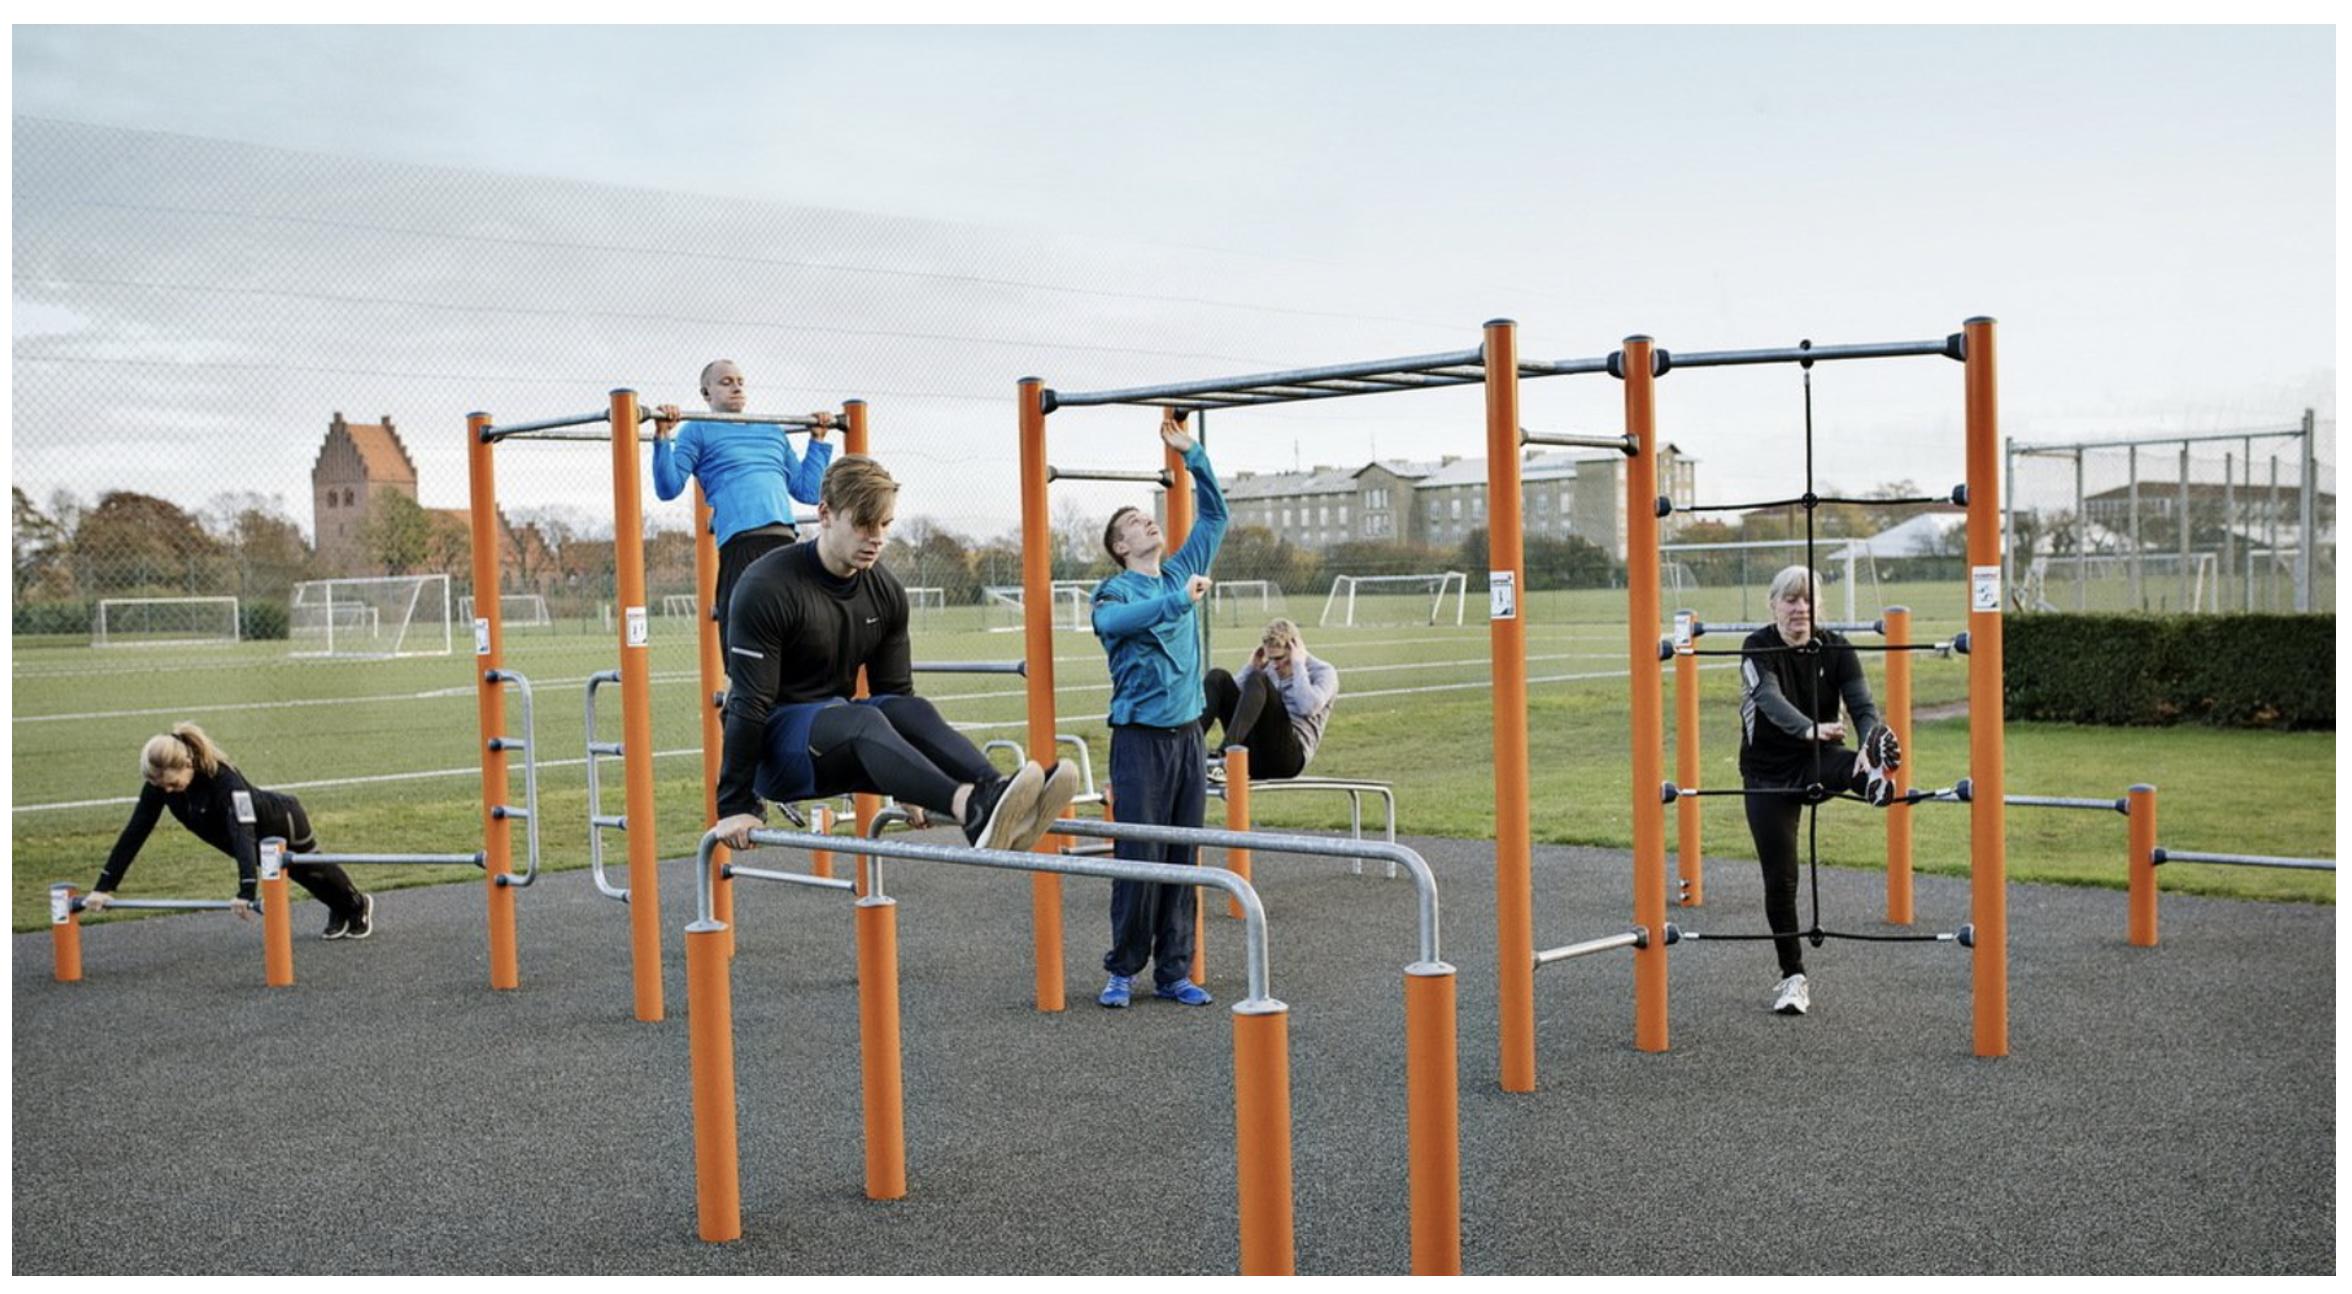 KOMPAN Outdoor Fitness Equipment